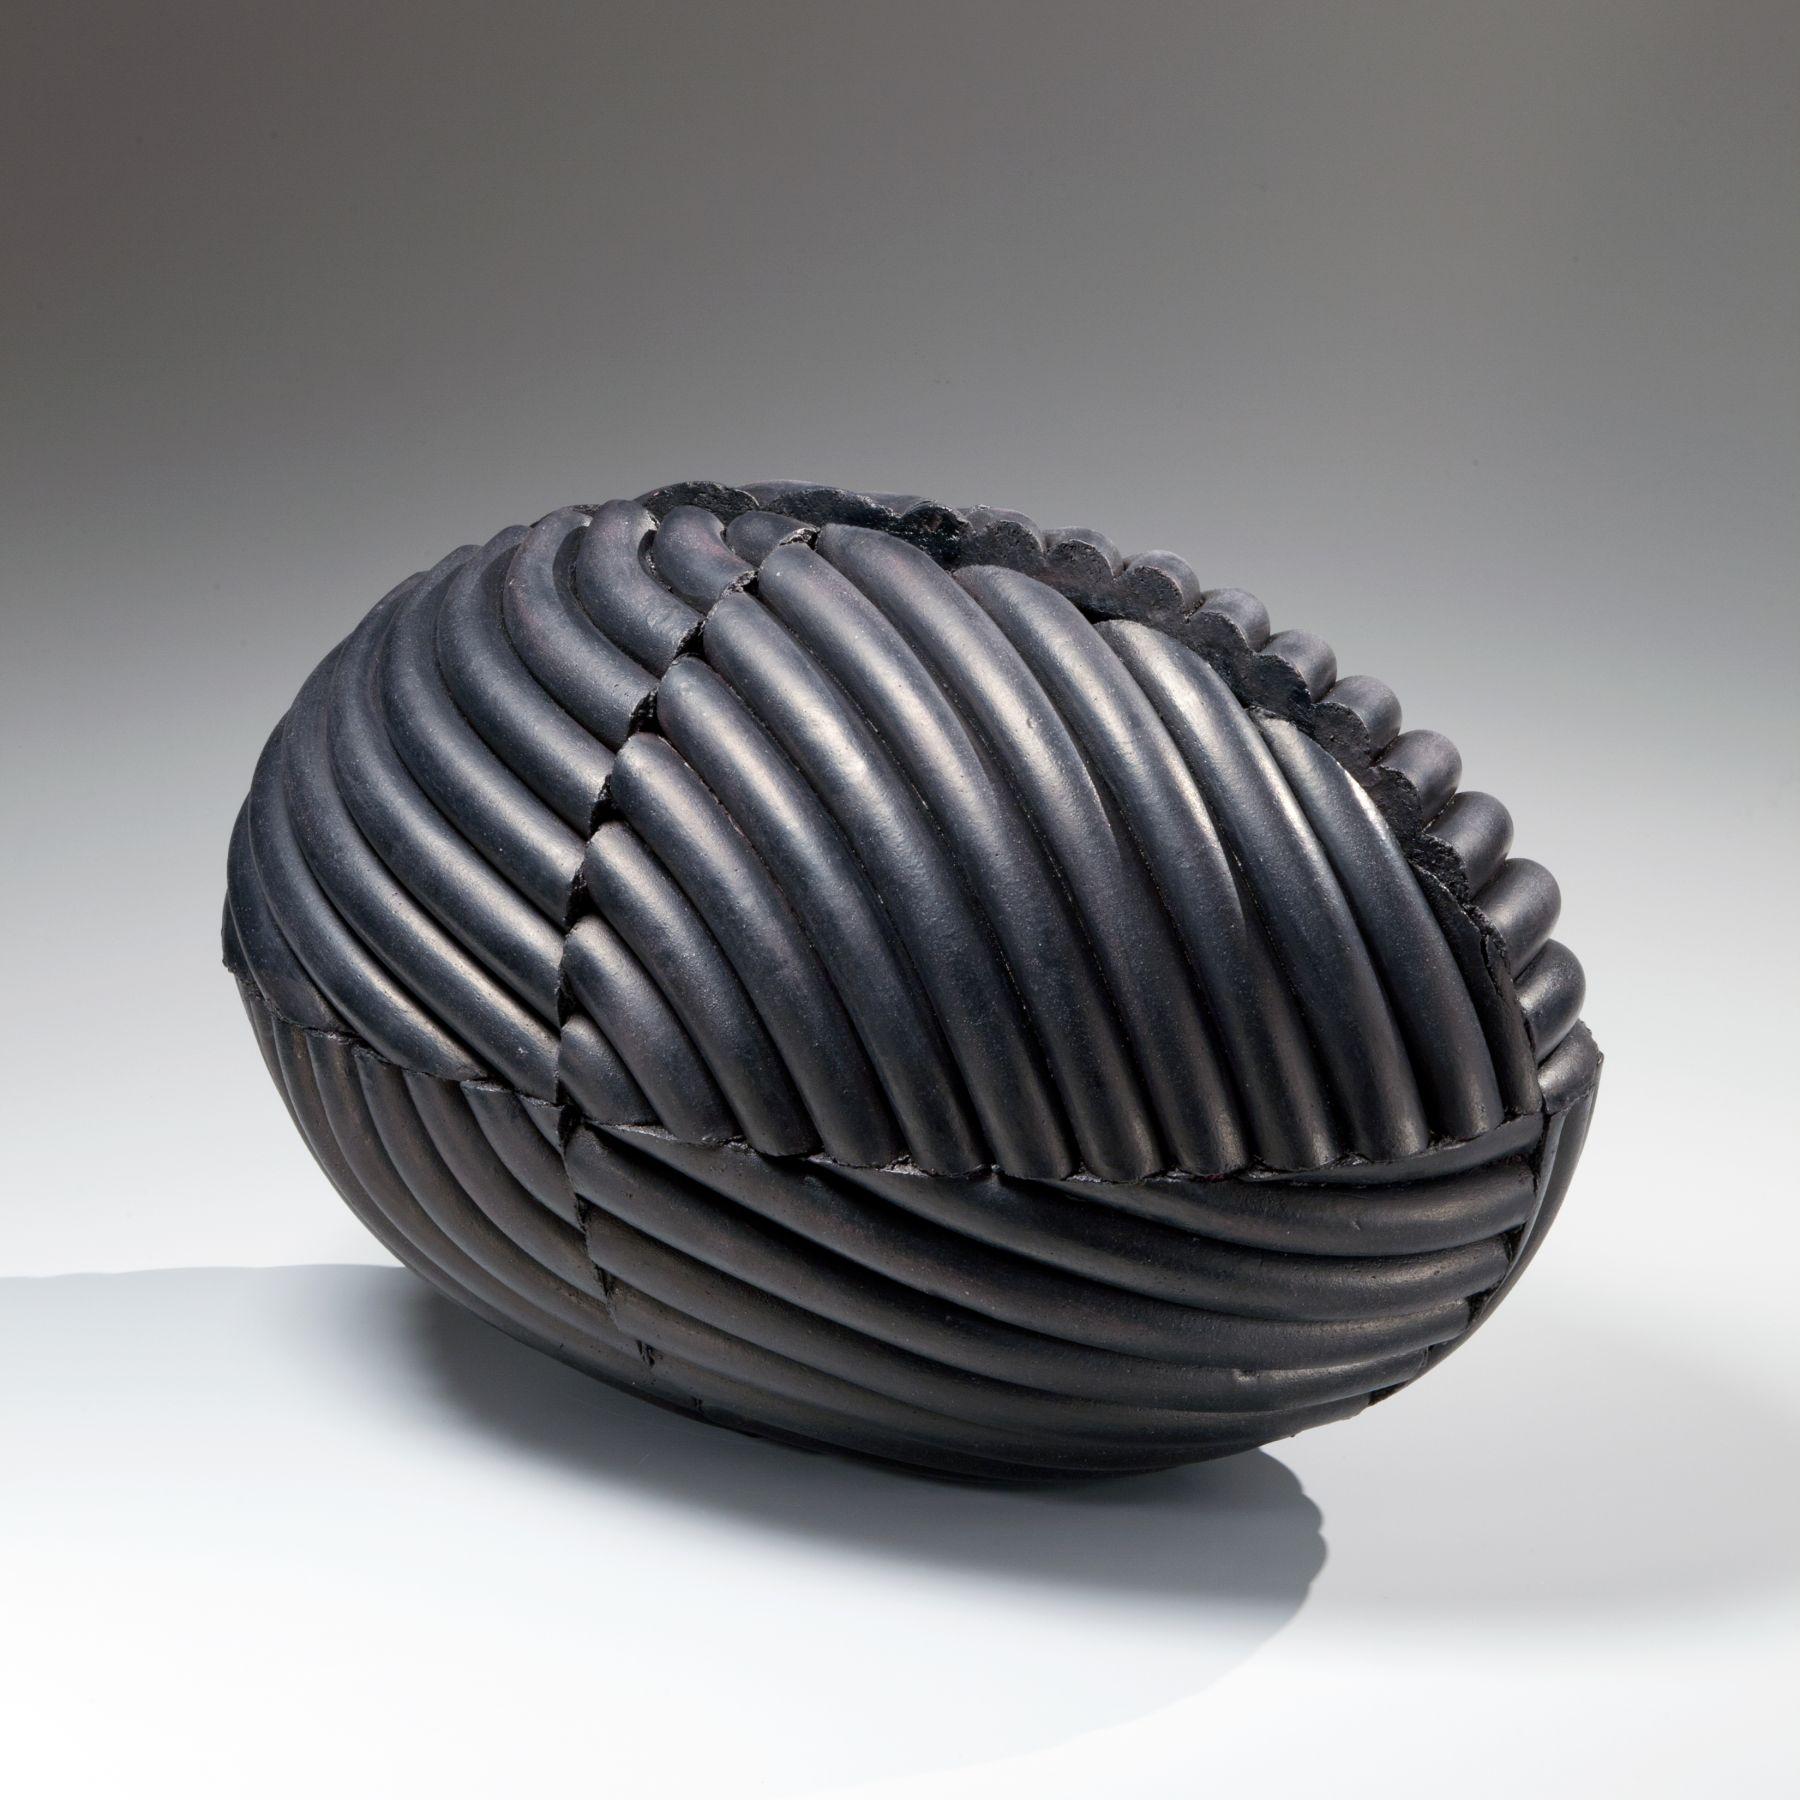 Imai Hyoe, Kukuto, Black Work, 2015, black smoke-infused stoneware, Japanese ceramics, Japanese pottery, Japanese sculpture, Japanese vessel, Japanese contemporary ceramics